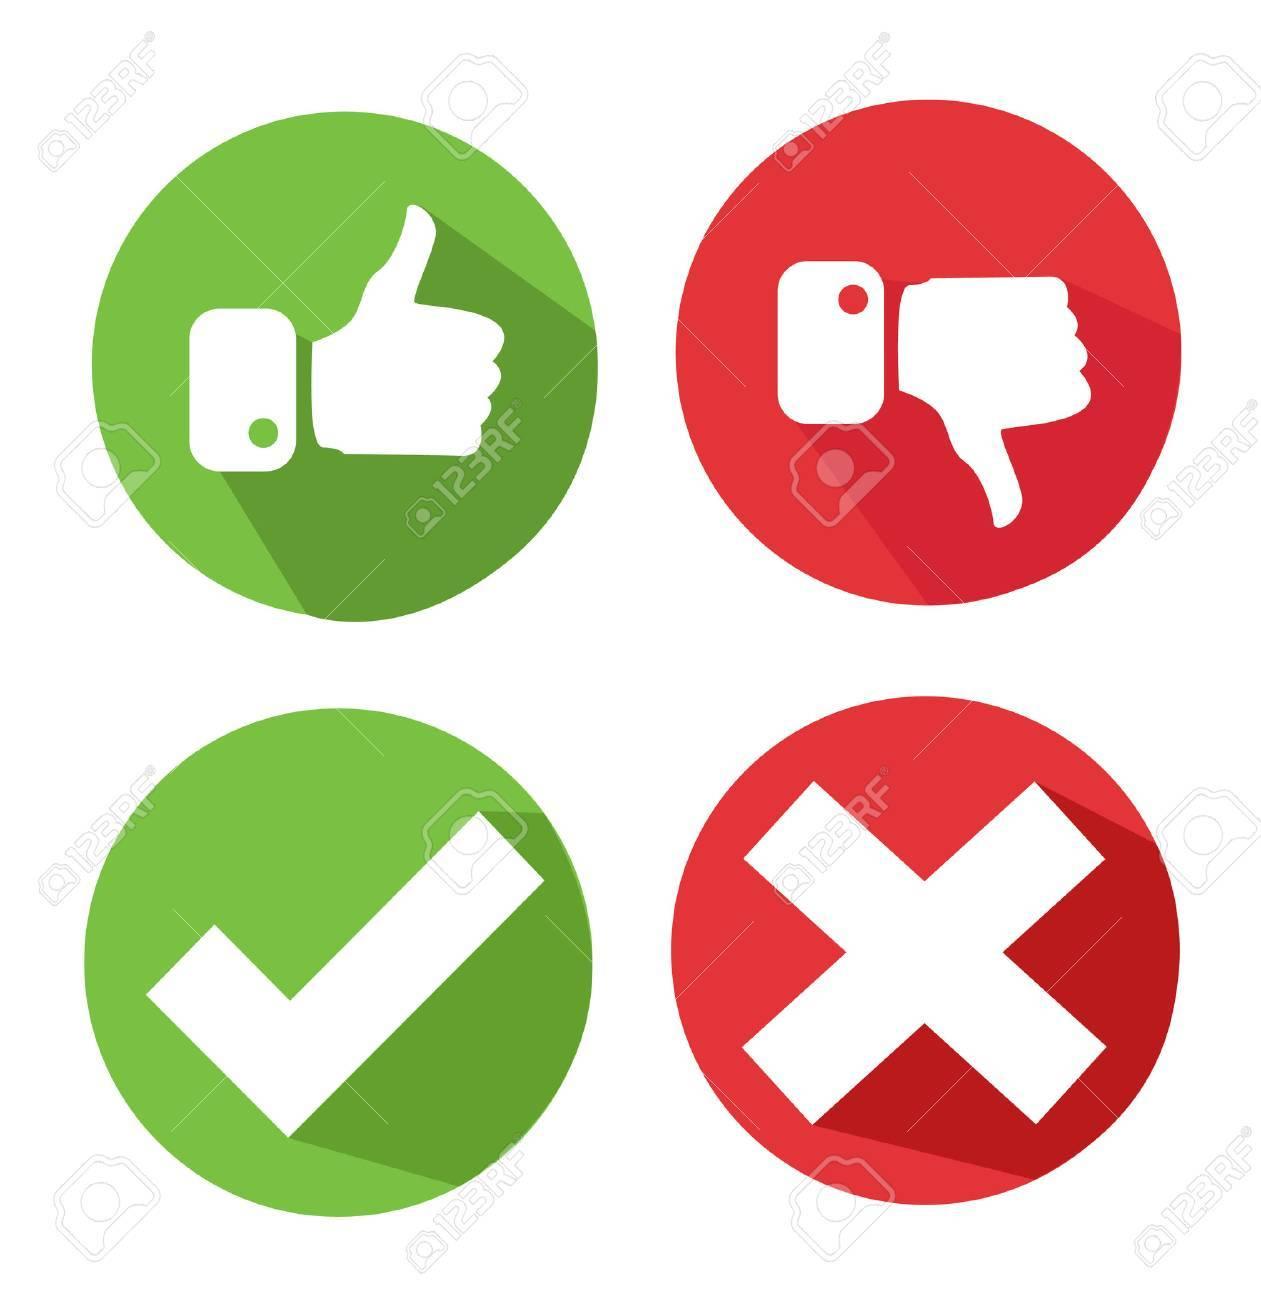 vector check mark icons - 44237882